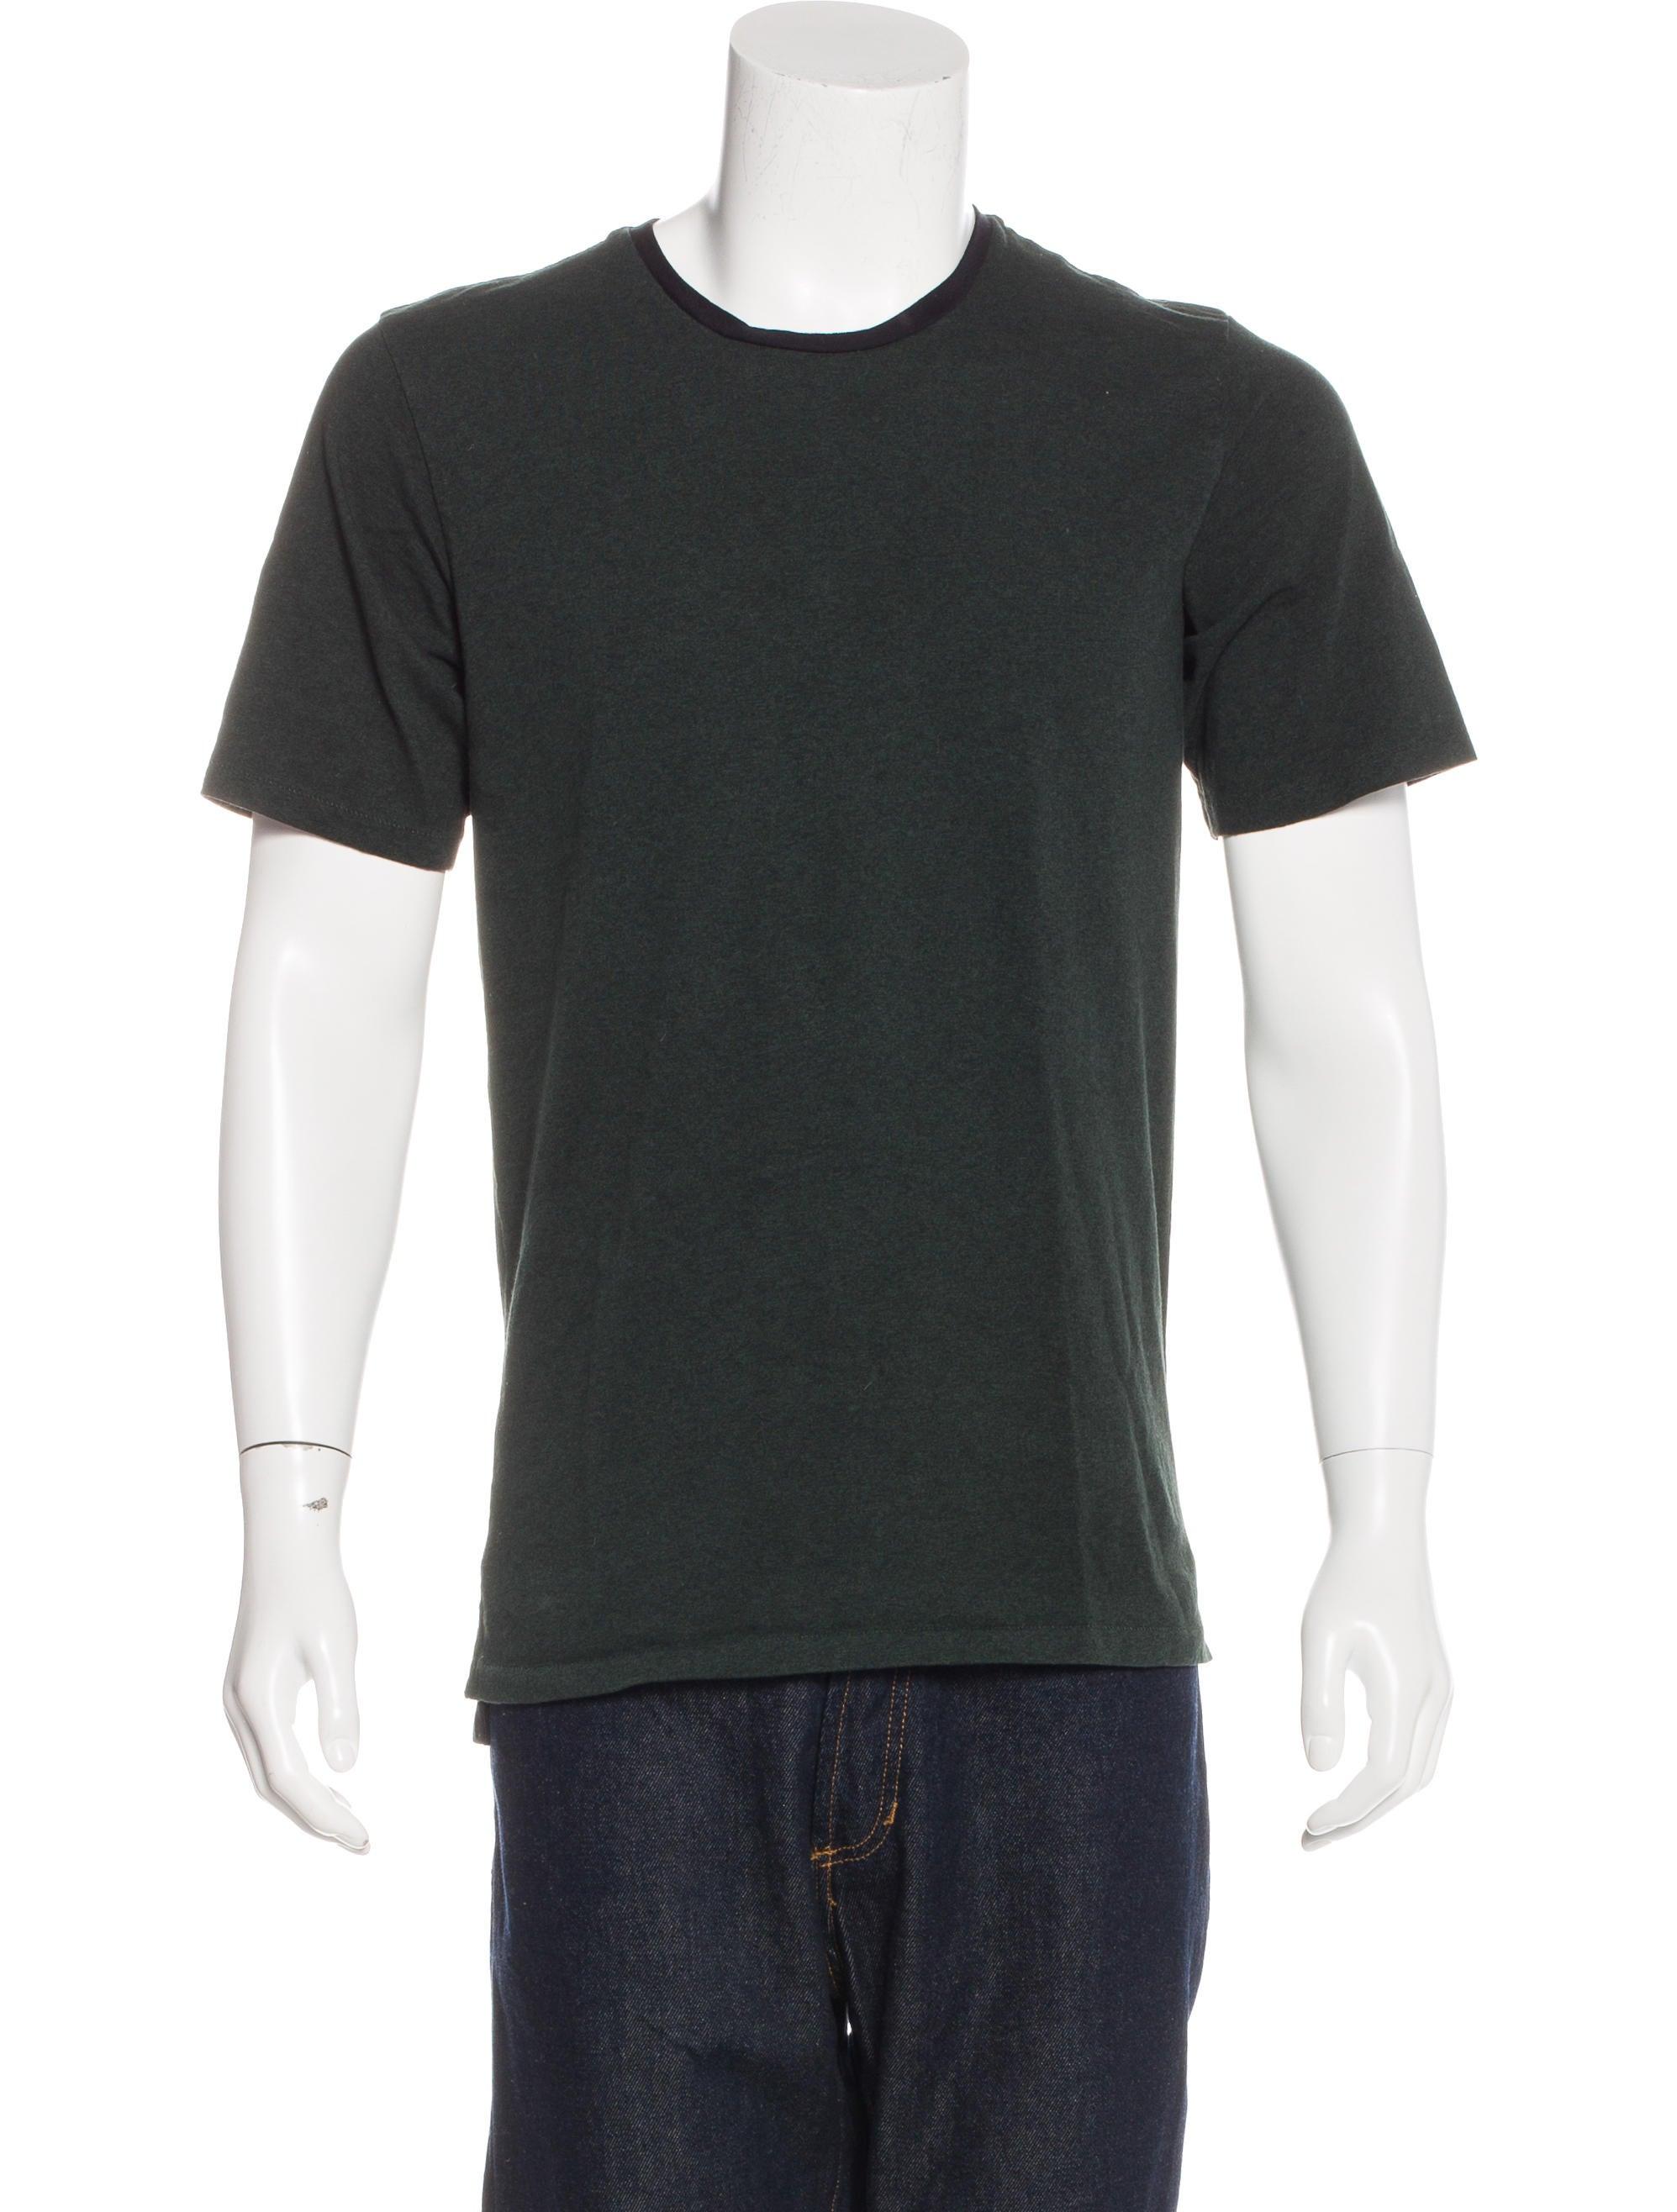 Rag Bone Crew Neck T Shirt Clothing Wragb69581 The